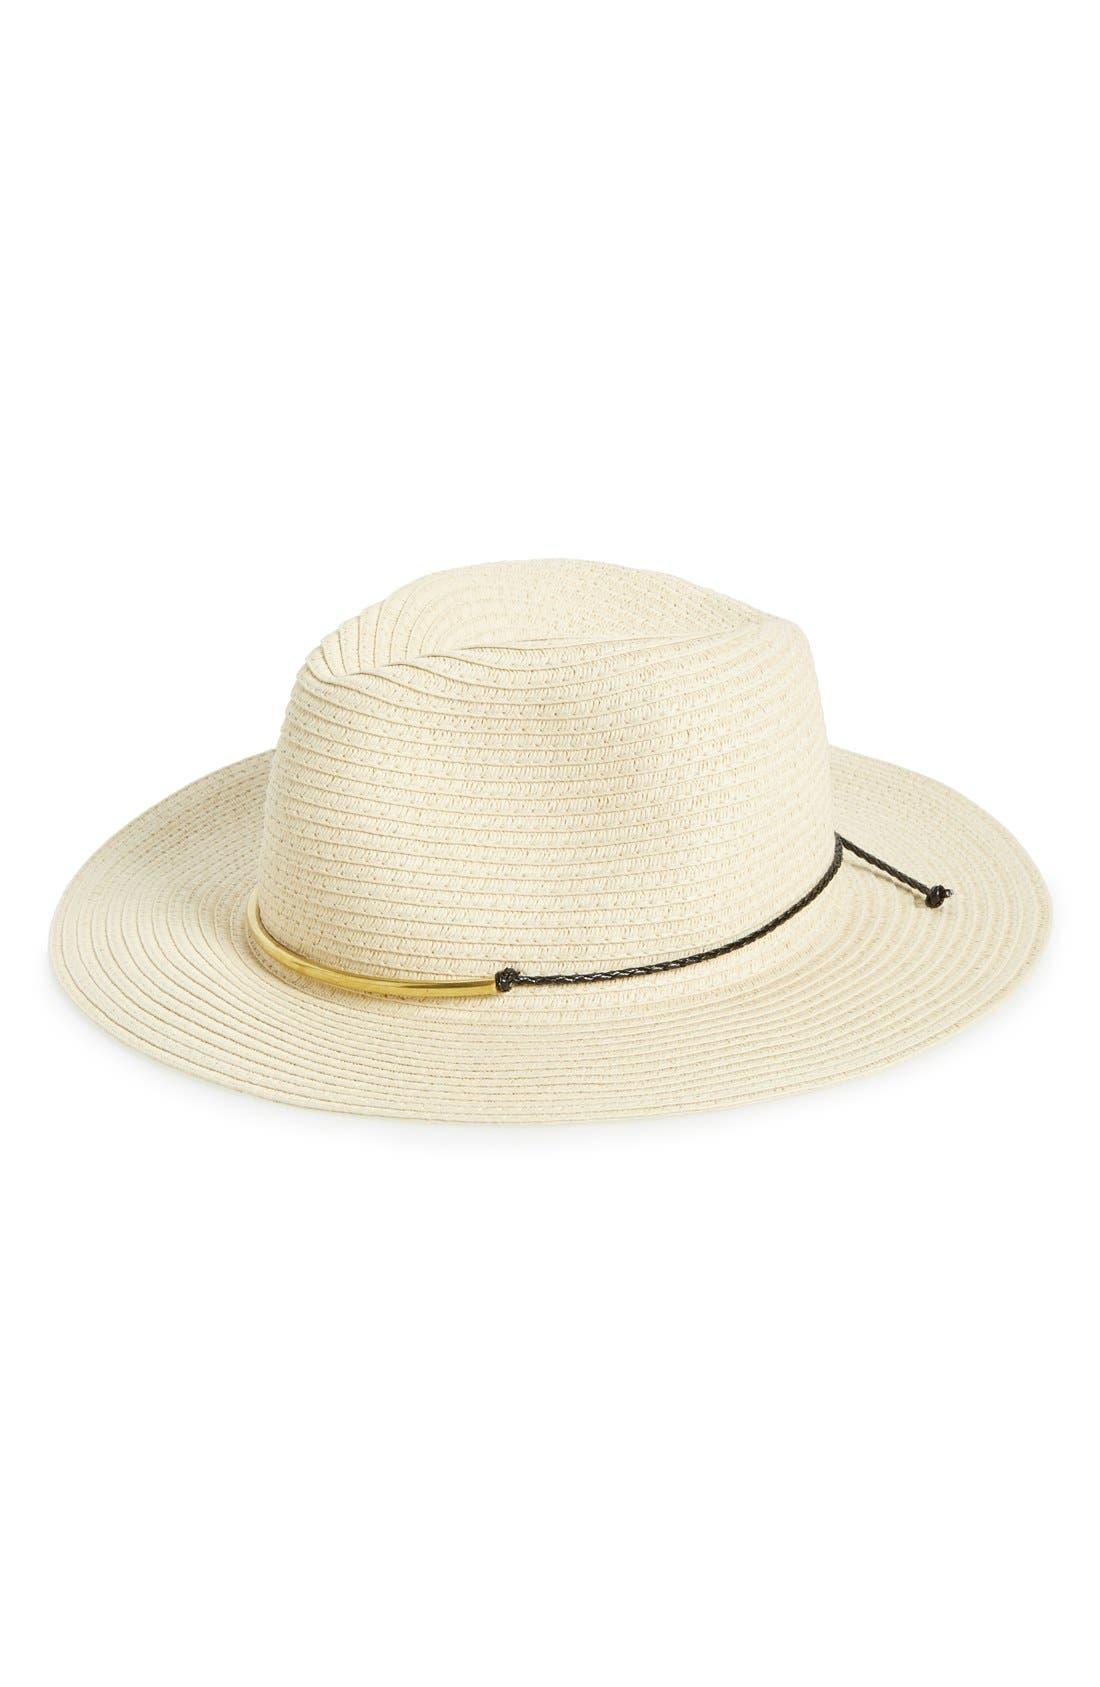 Alternate Image 1 Selected - Phase 3 Metal Trim Panama Hat